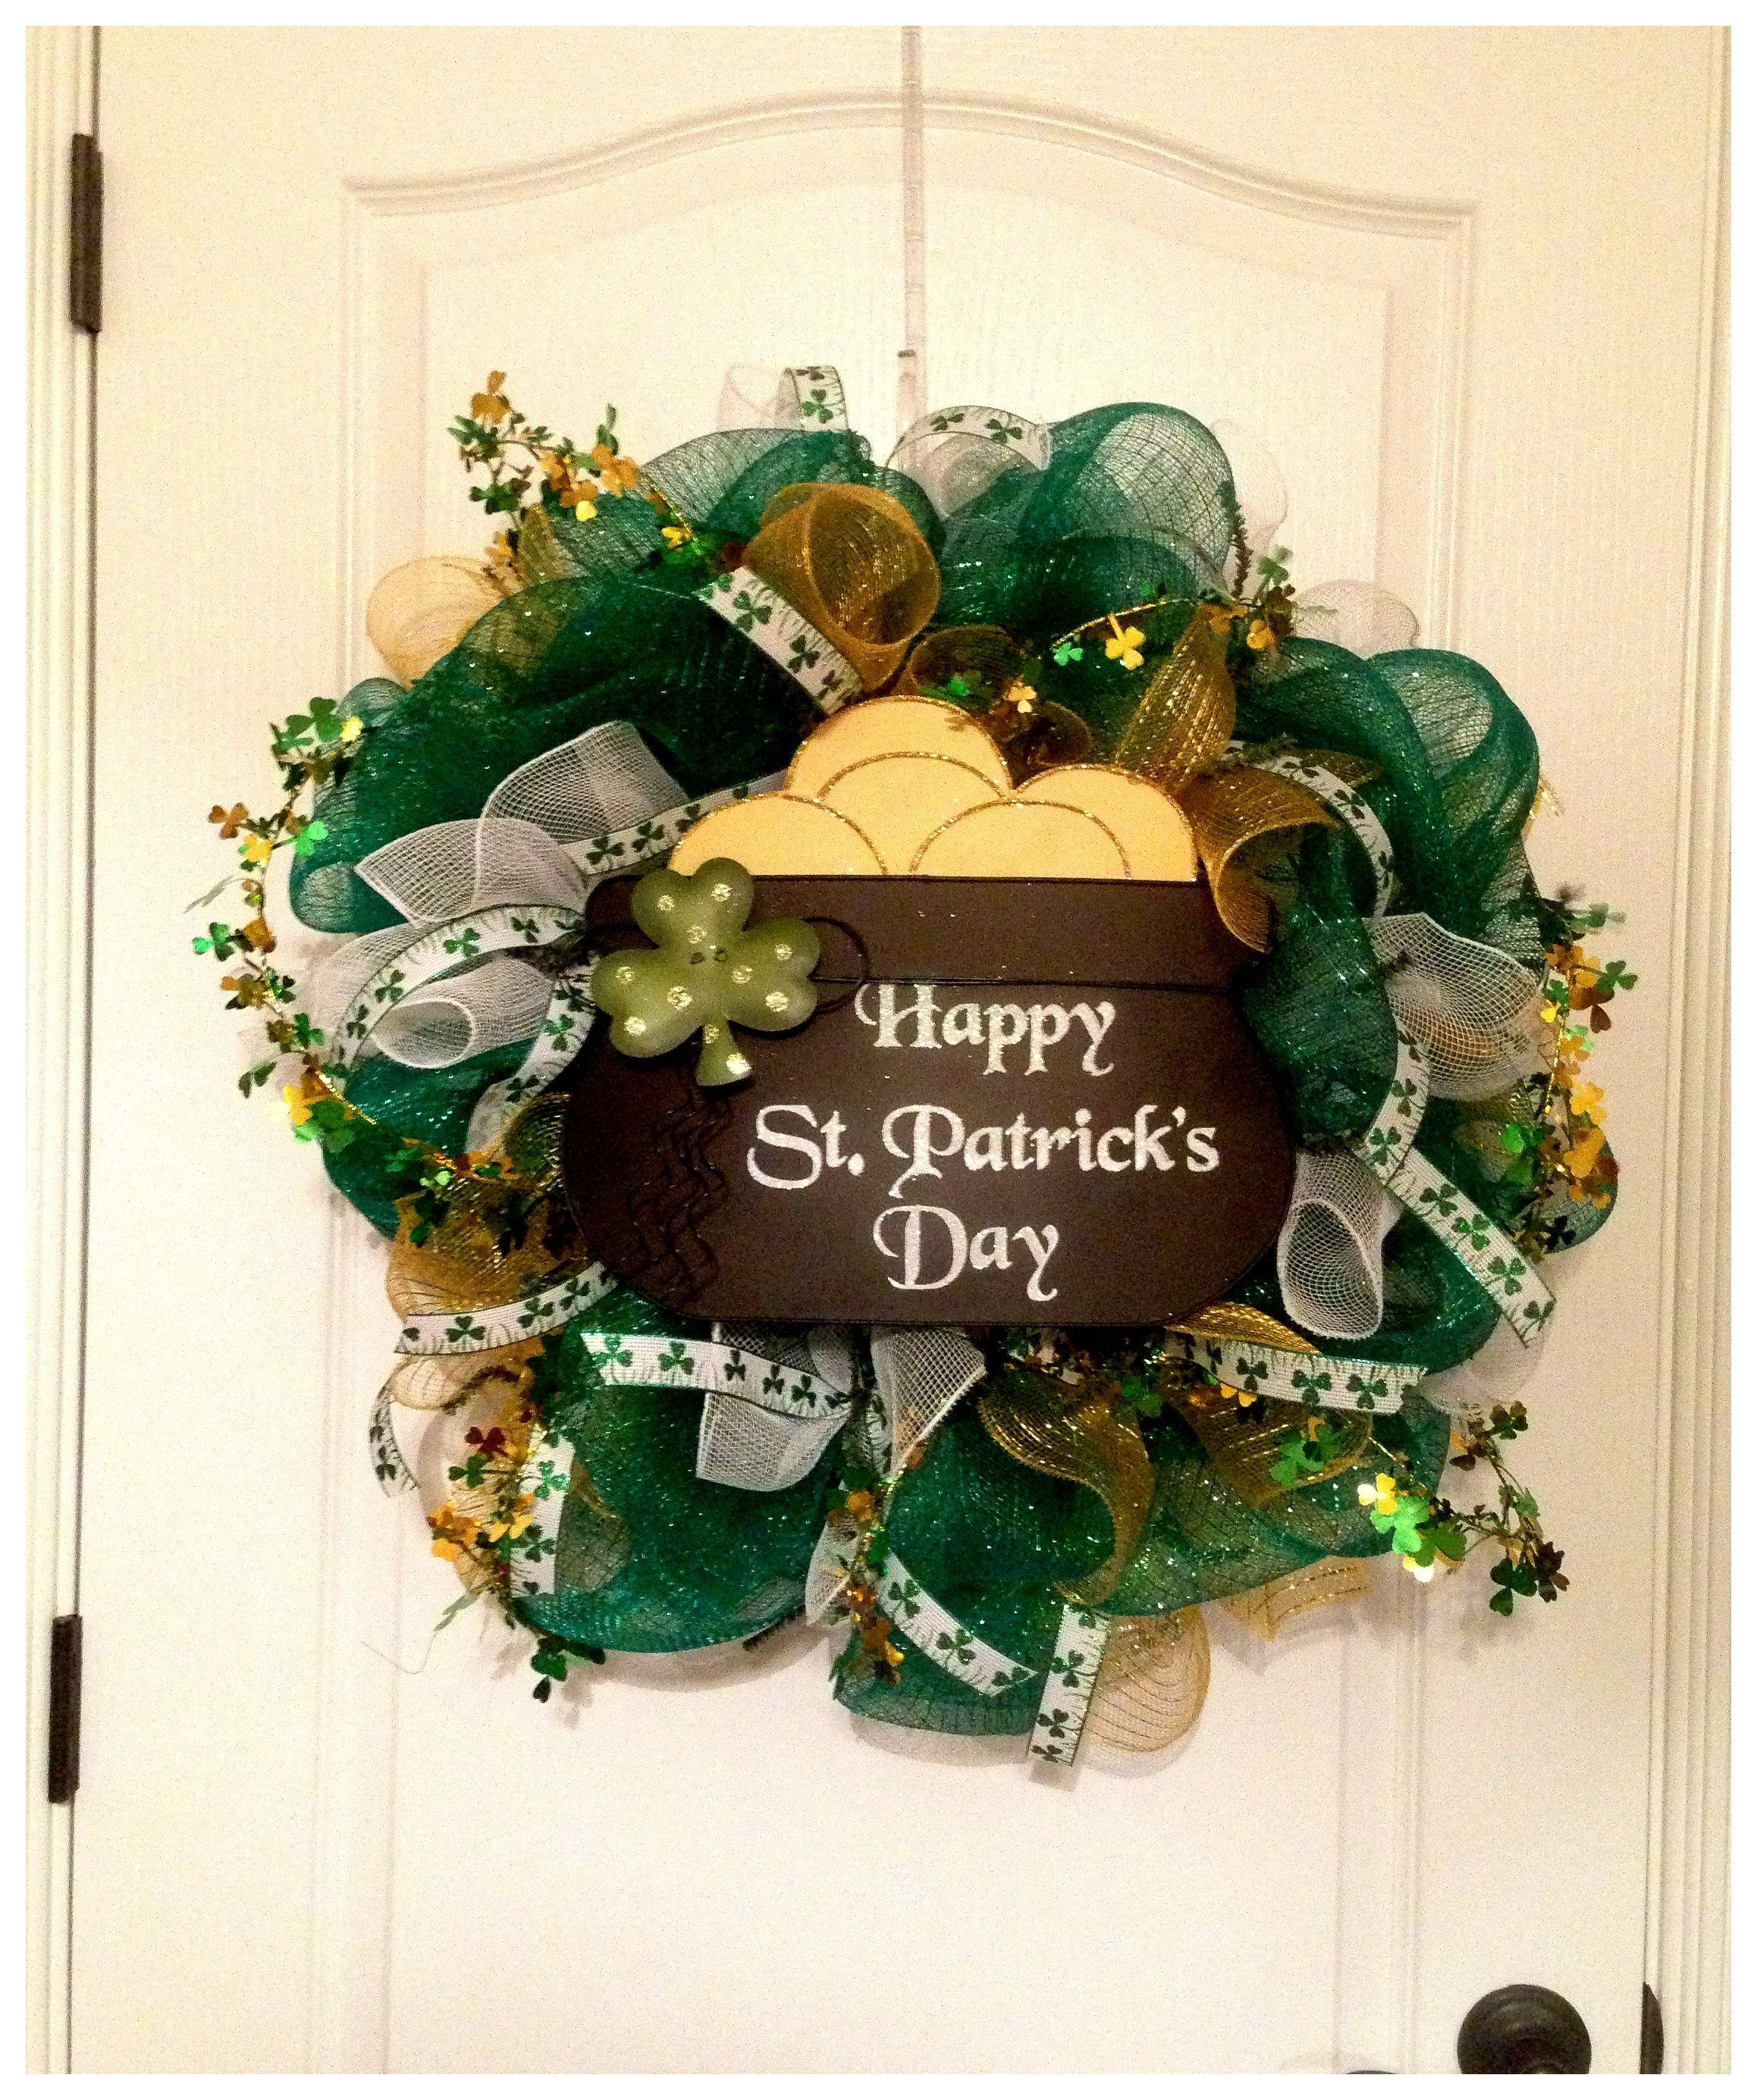 st patricks deco mesh wreath wreaths pinterest wreaths wreaths crafts and door wreaths. Black Bedroom Furniture Sets. Home Design Ideas